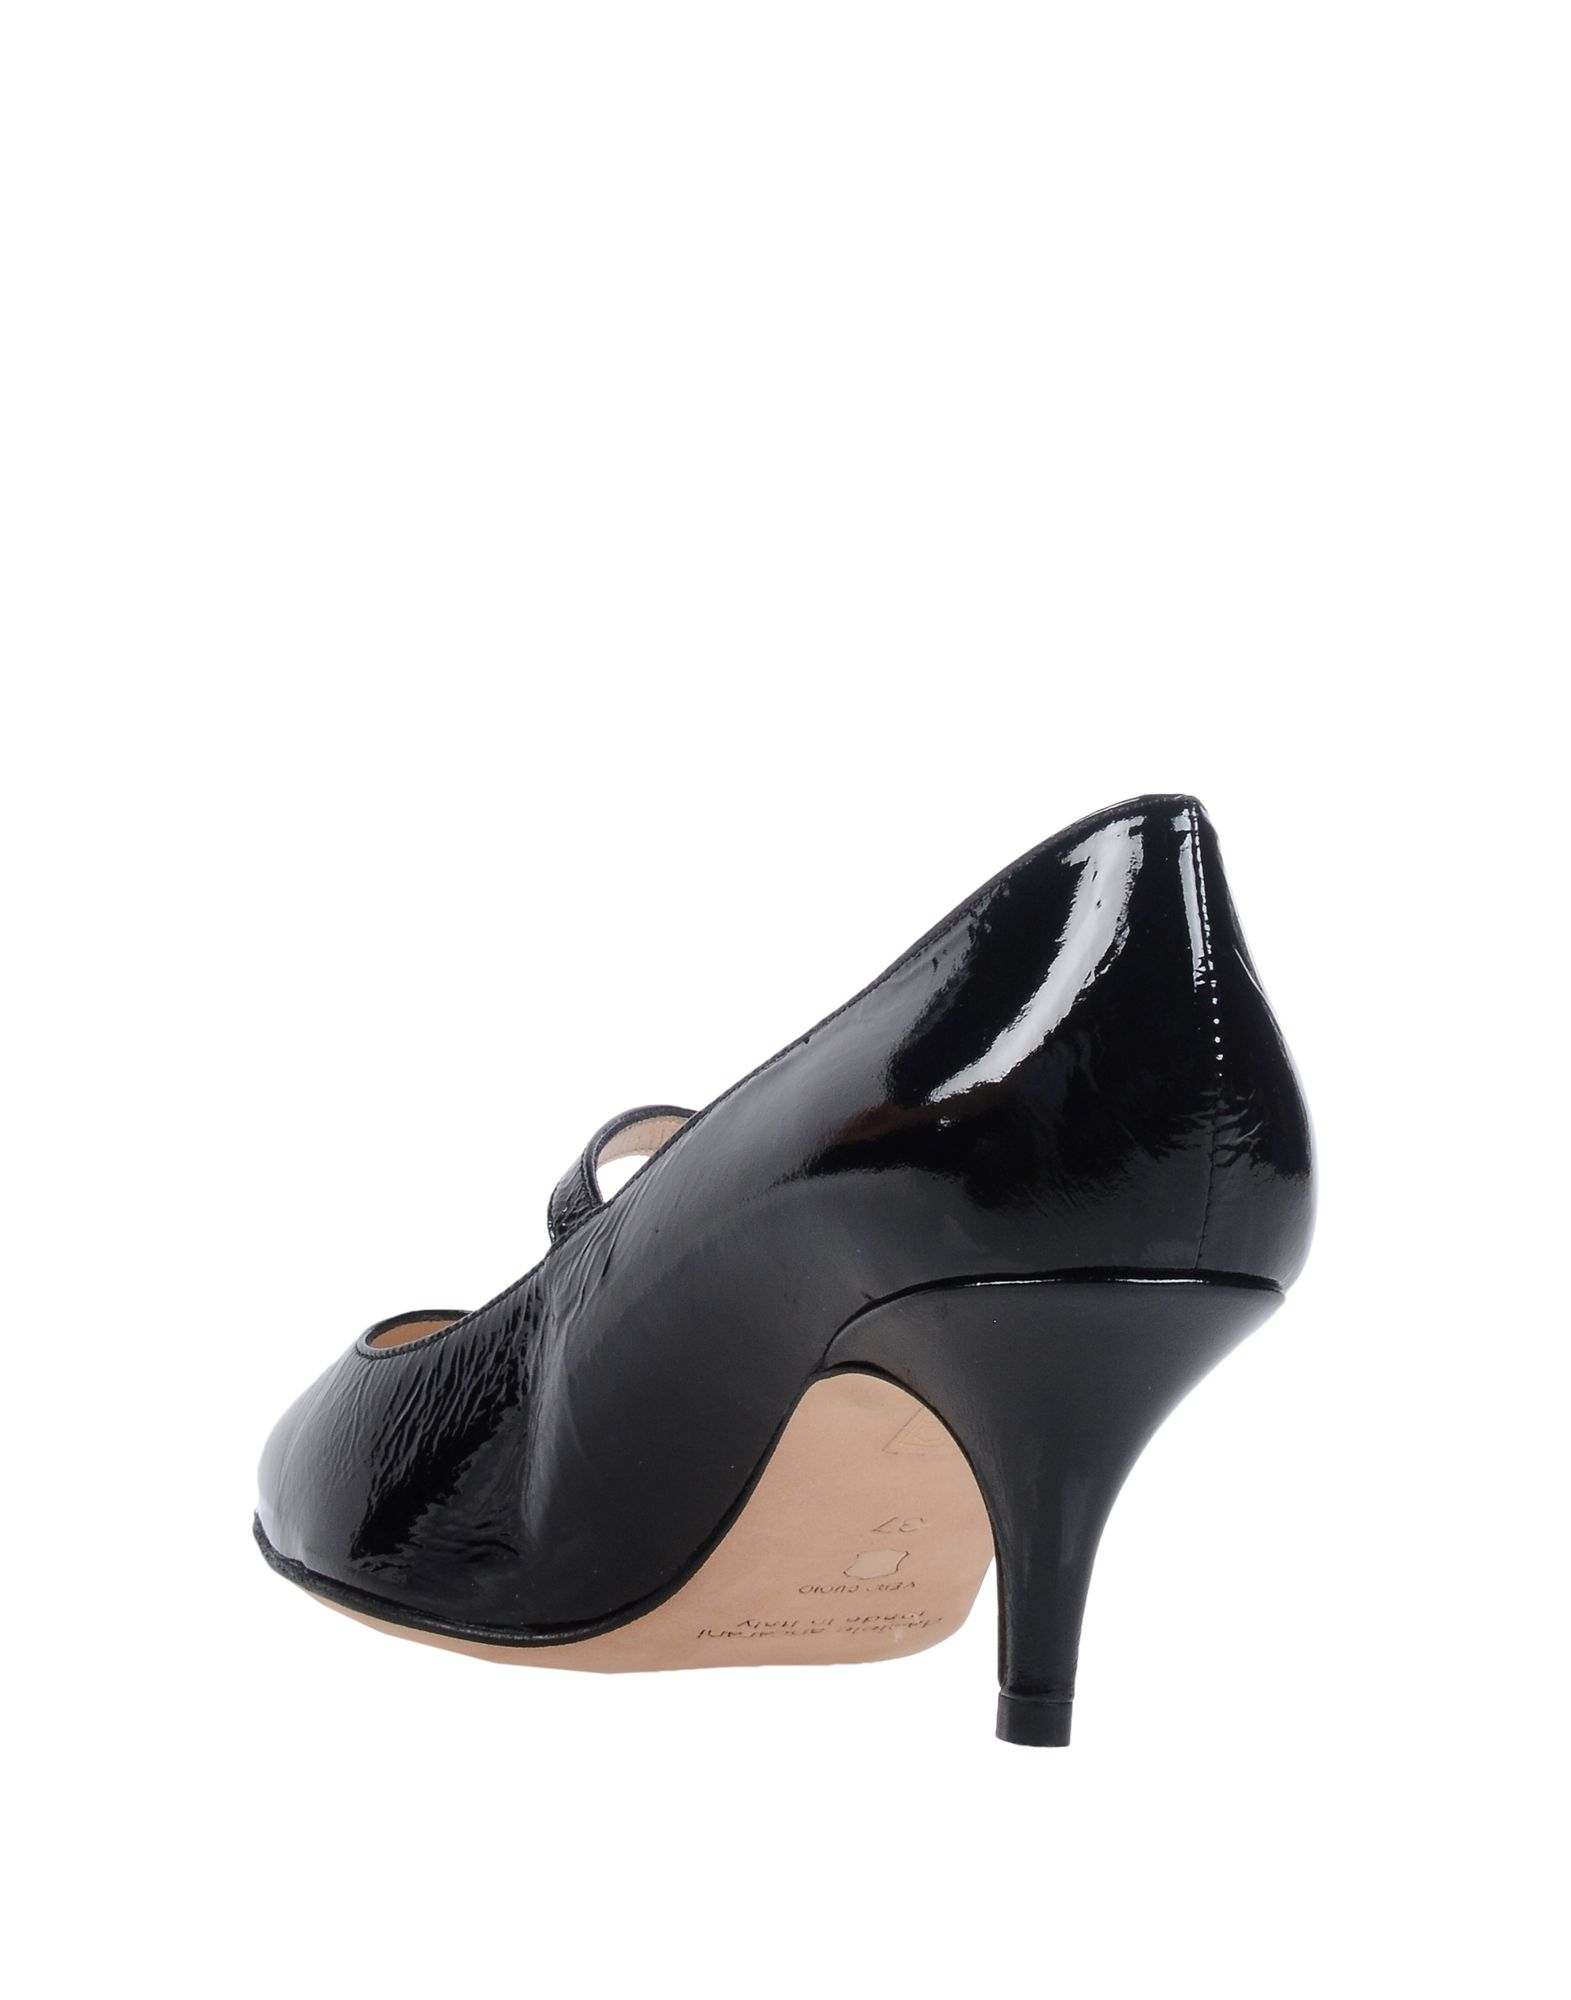 Stilvolle Pumps billige Schuhe Daniele Ancarani Pumps Stilvolle Damen  11525714JS ed9c86